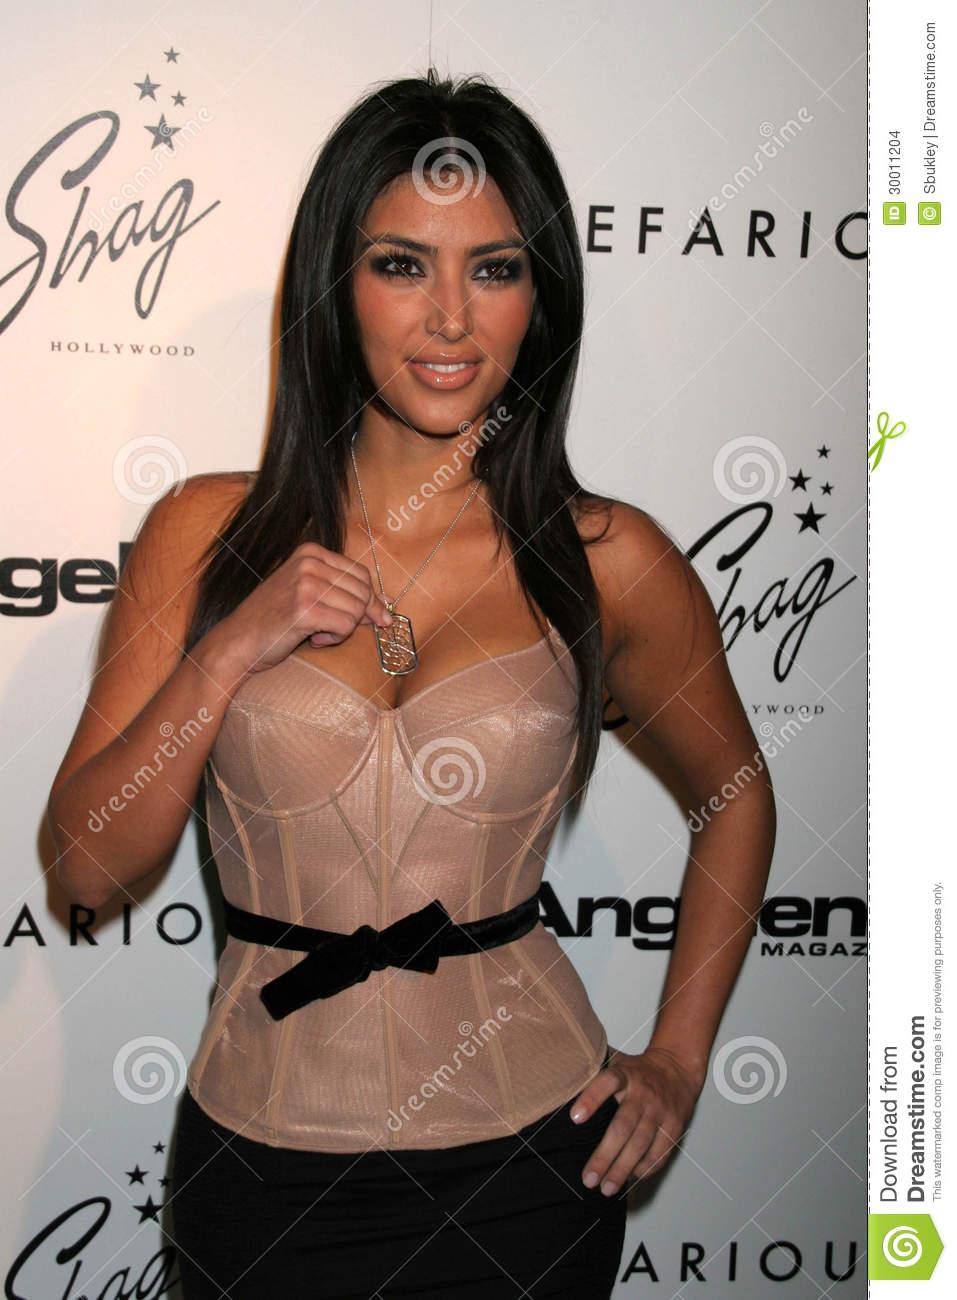 Kim Kardashian Clipart-Clipartlook.com-9-Kim Kardashian Clipart-Clipartlook.com-957-3